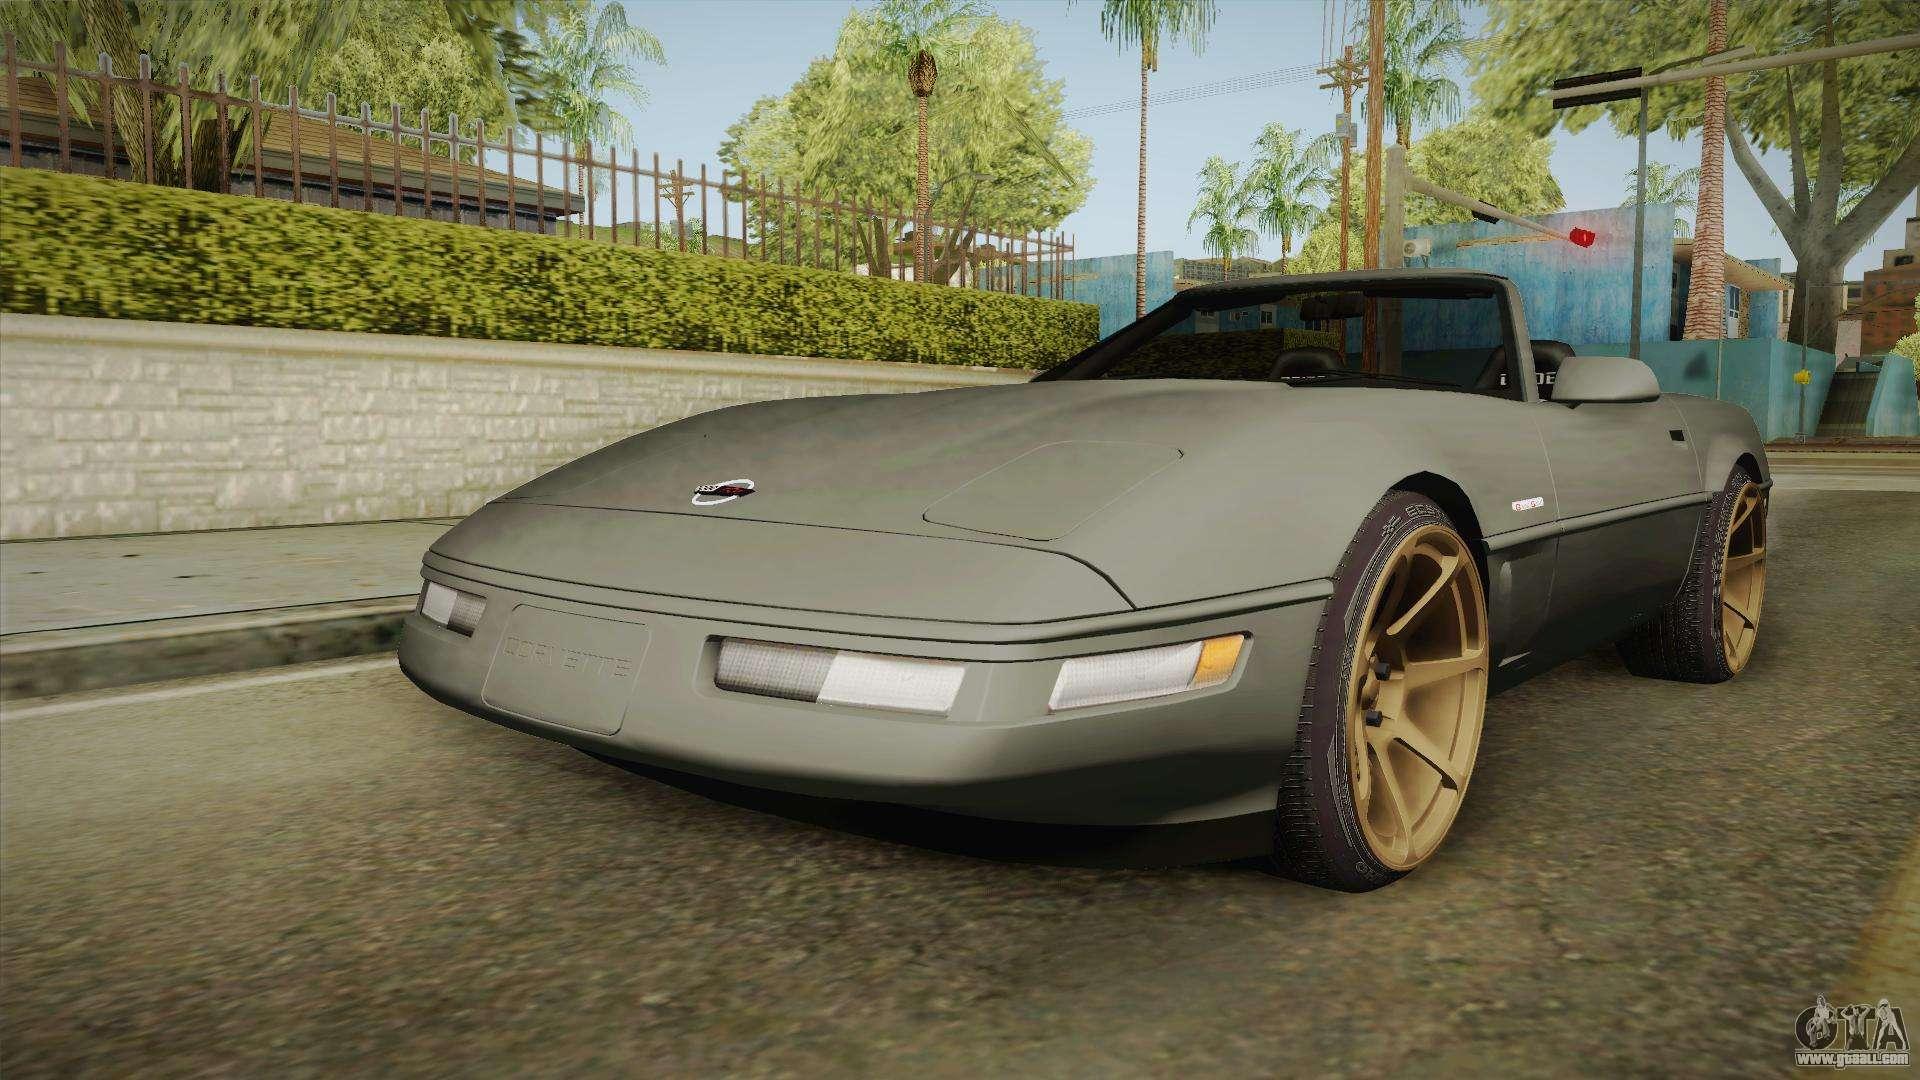 chevrolet corvette c4 cabrio drift 1996 for gta san andreas. Black Bedroom Furniture Sets. Home Design Ideas